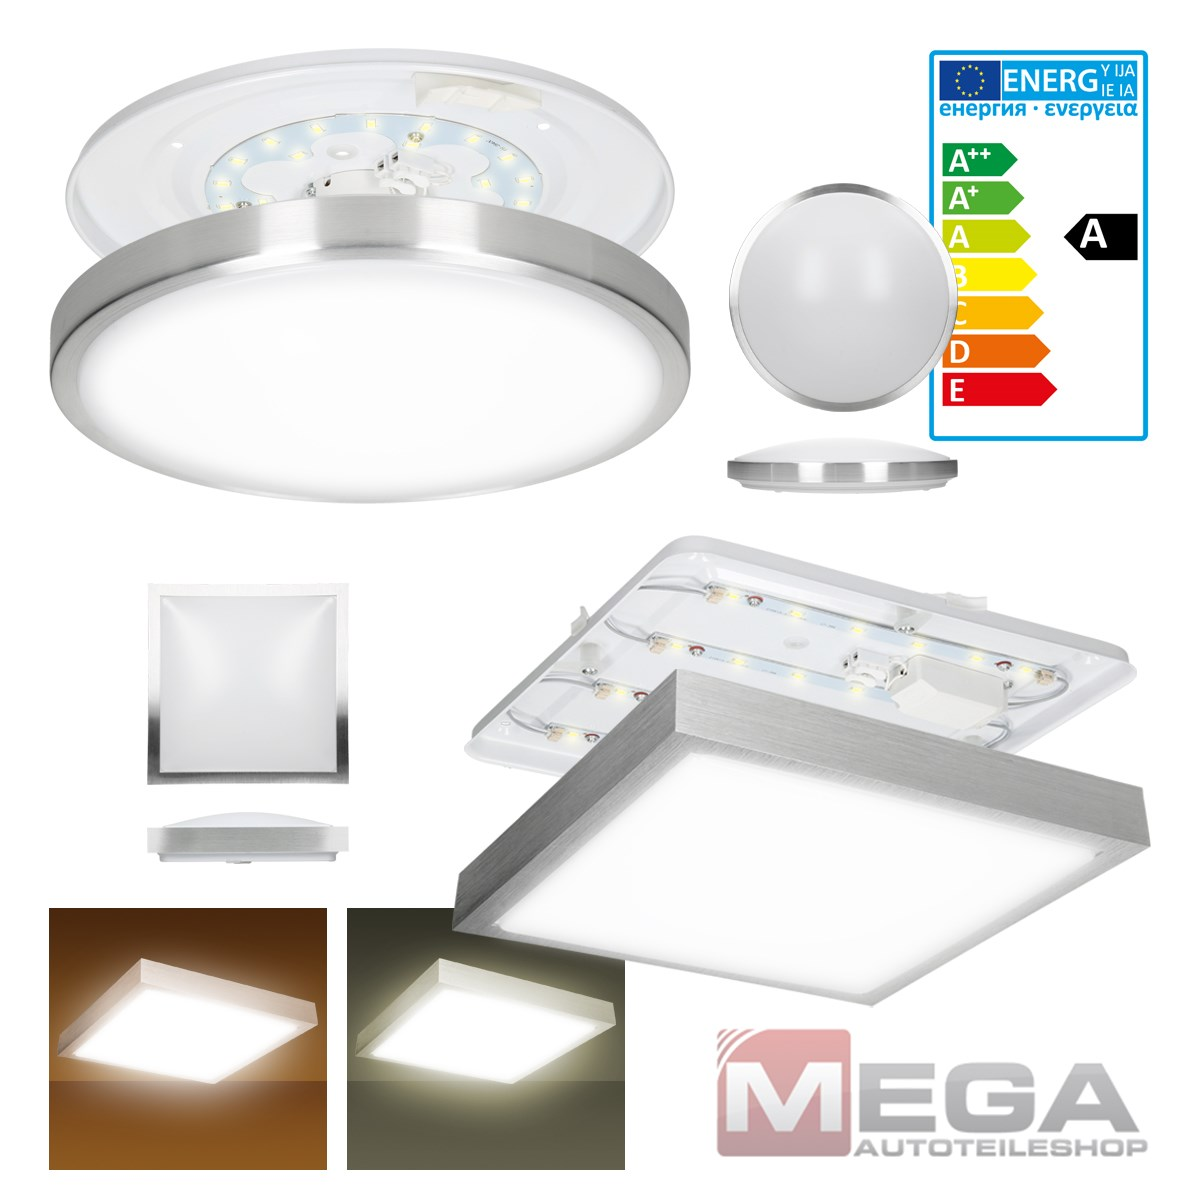 Led deckenleuchte lampe deckenlampe wandlampe aufbaulampe for Deckenlampe eckig led